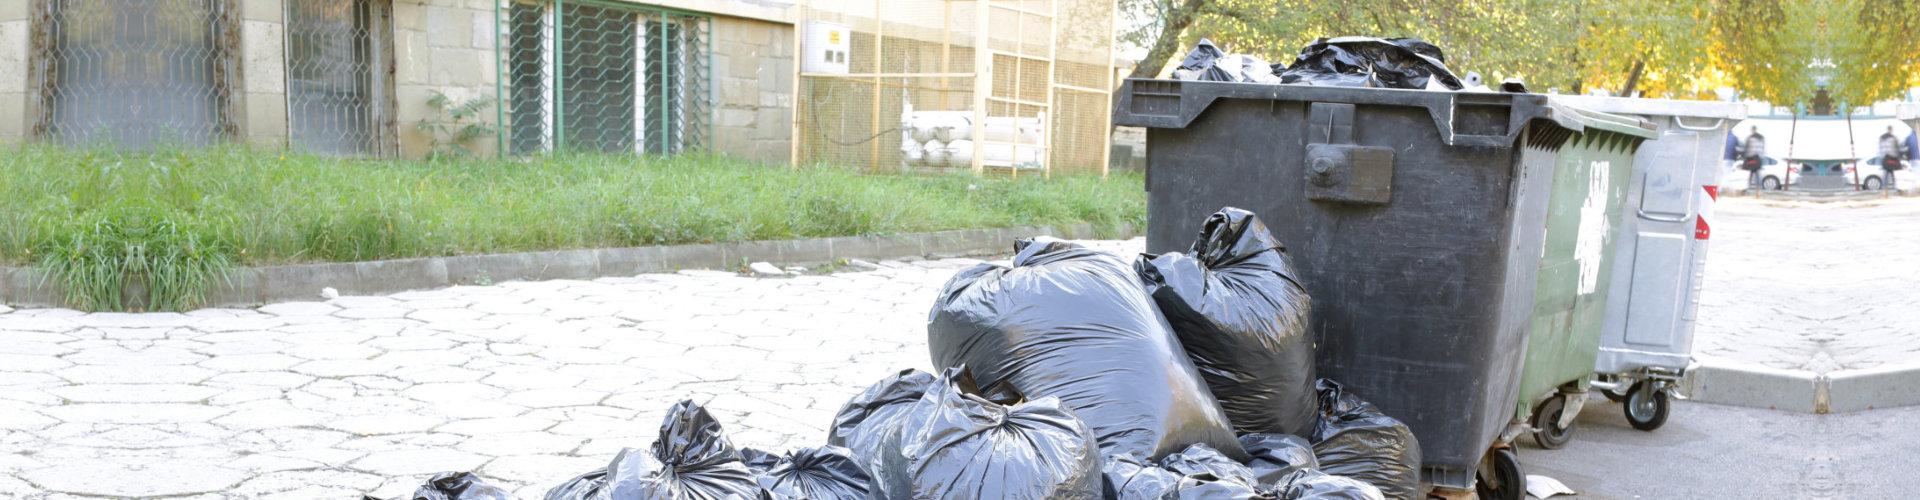 trash bin on the road